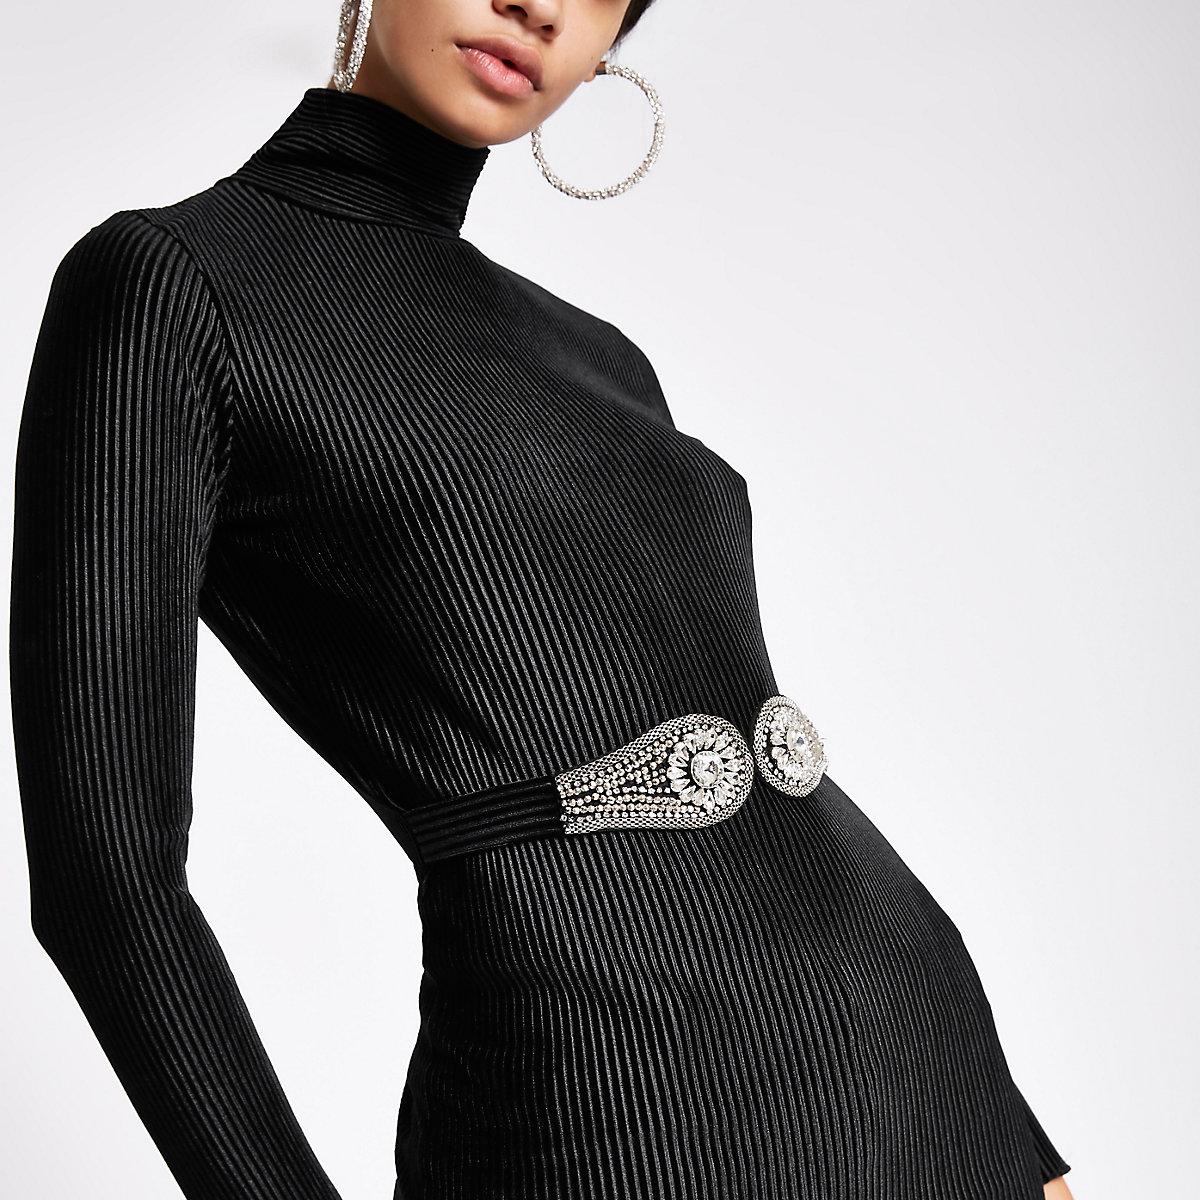 Black velvet pleated rhinestone belted top